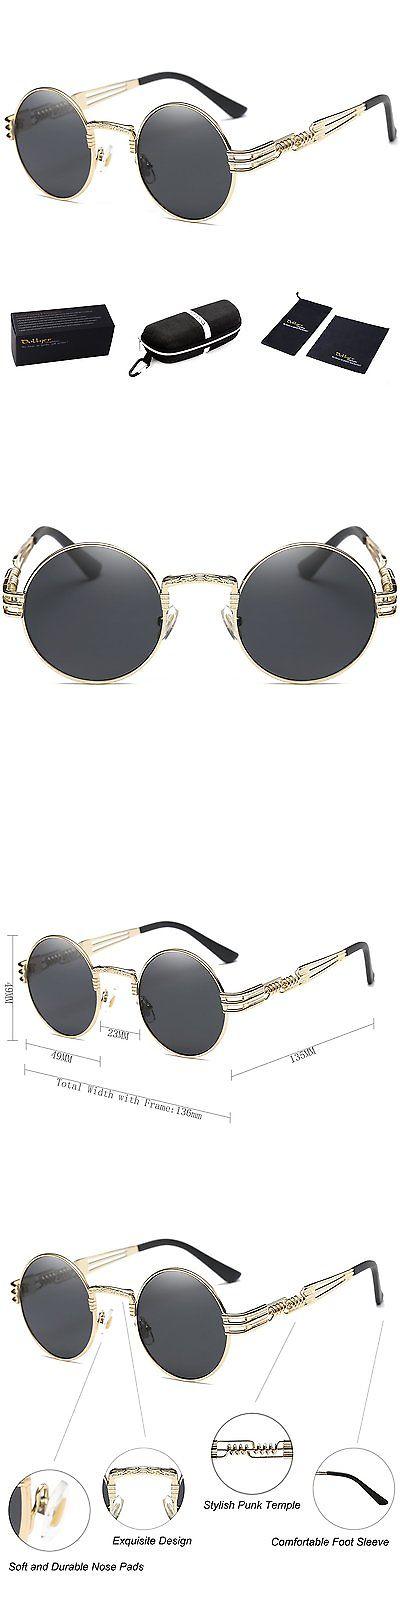 7af101c4eb Glasses 175646  Dollger John Lennon Round Sunglasses Steampunk Metal Spring  Frame Mirror Lens -  BUY IT NOW ONLY   30.28 on eBay!